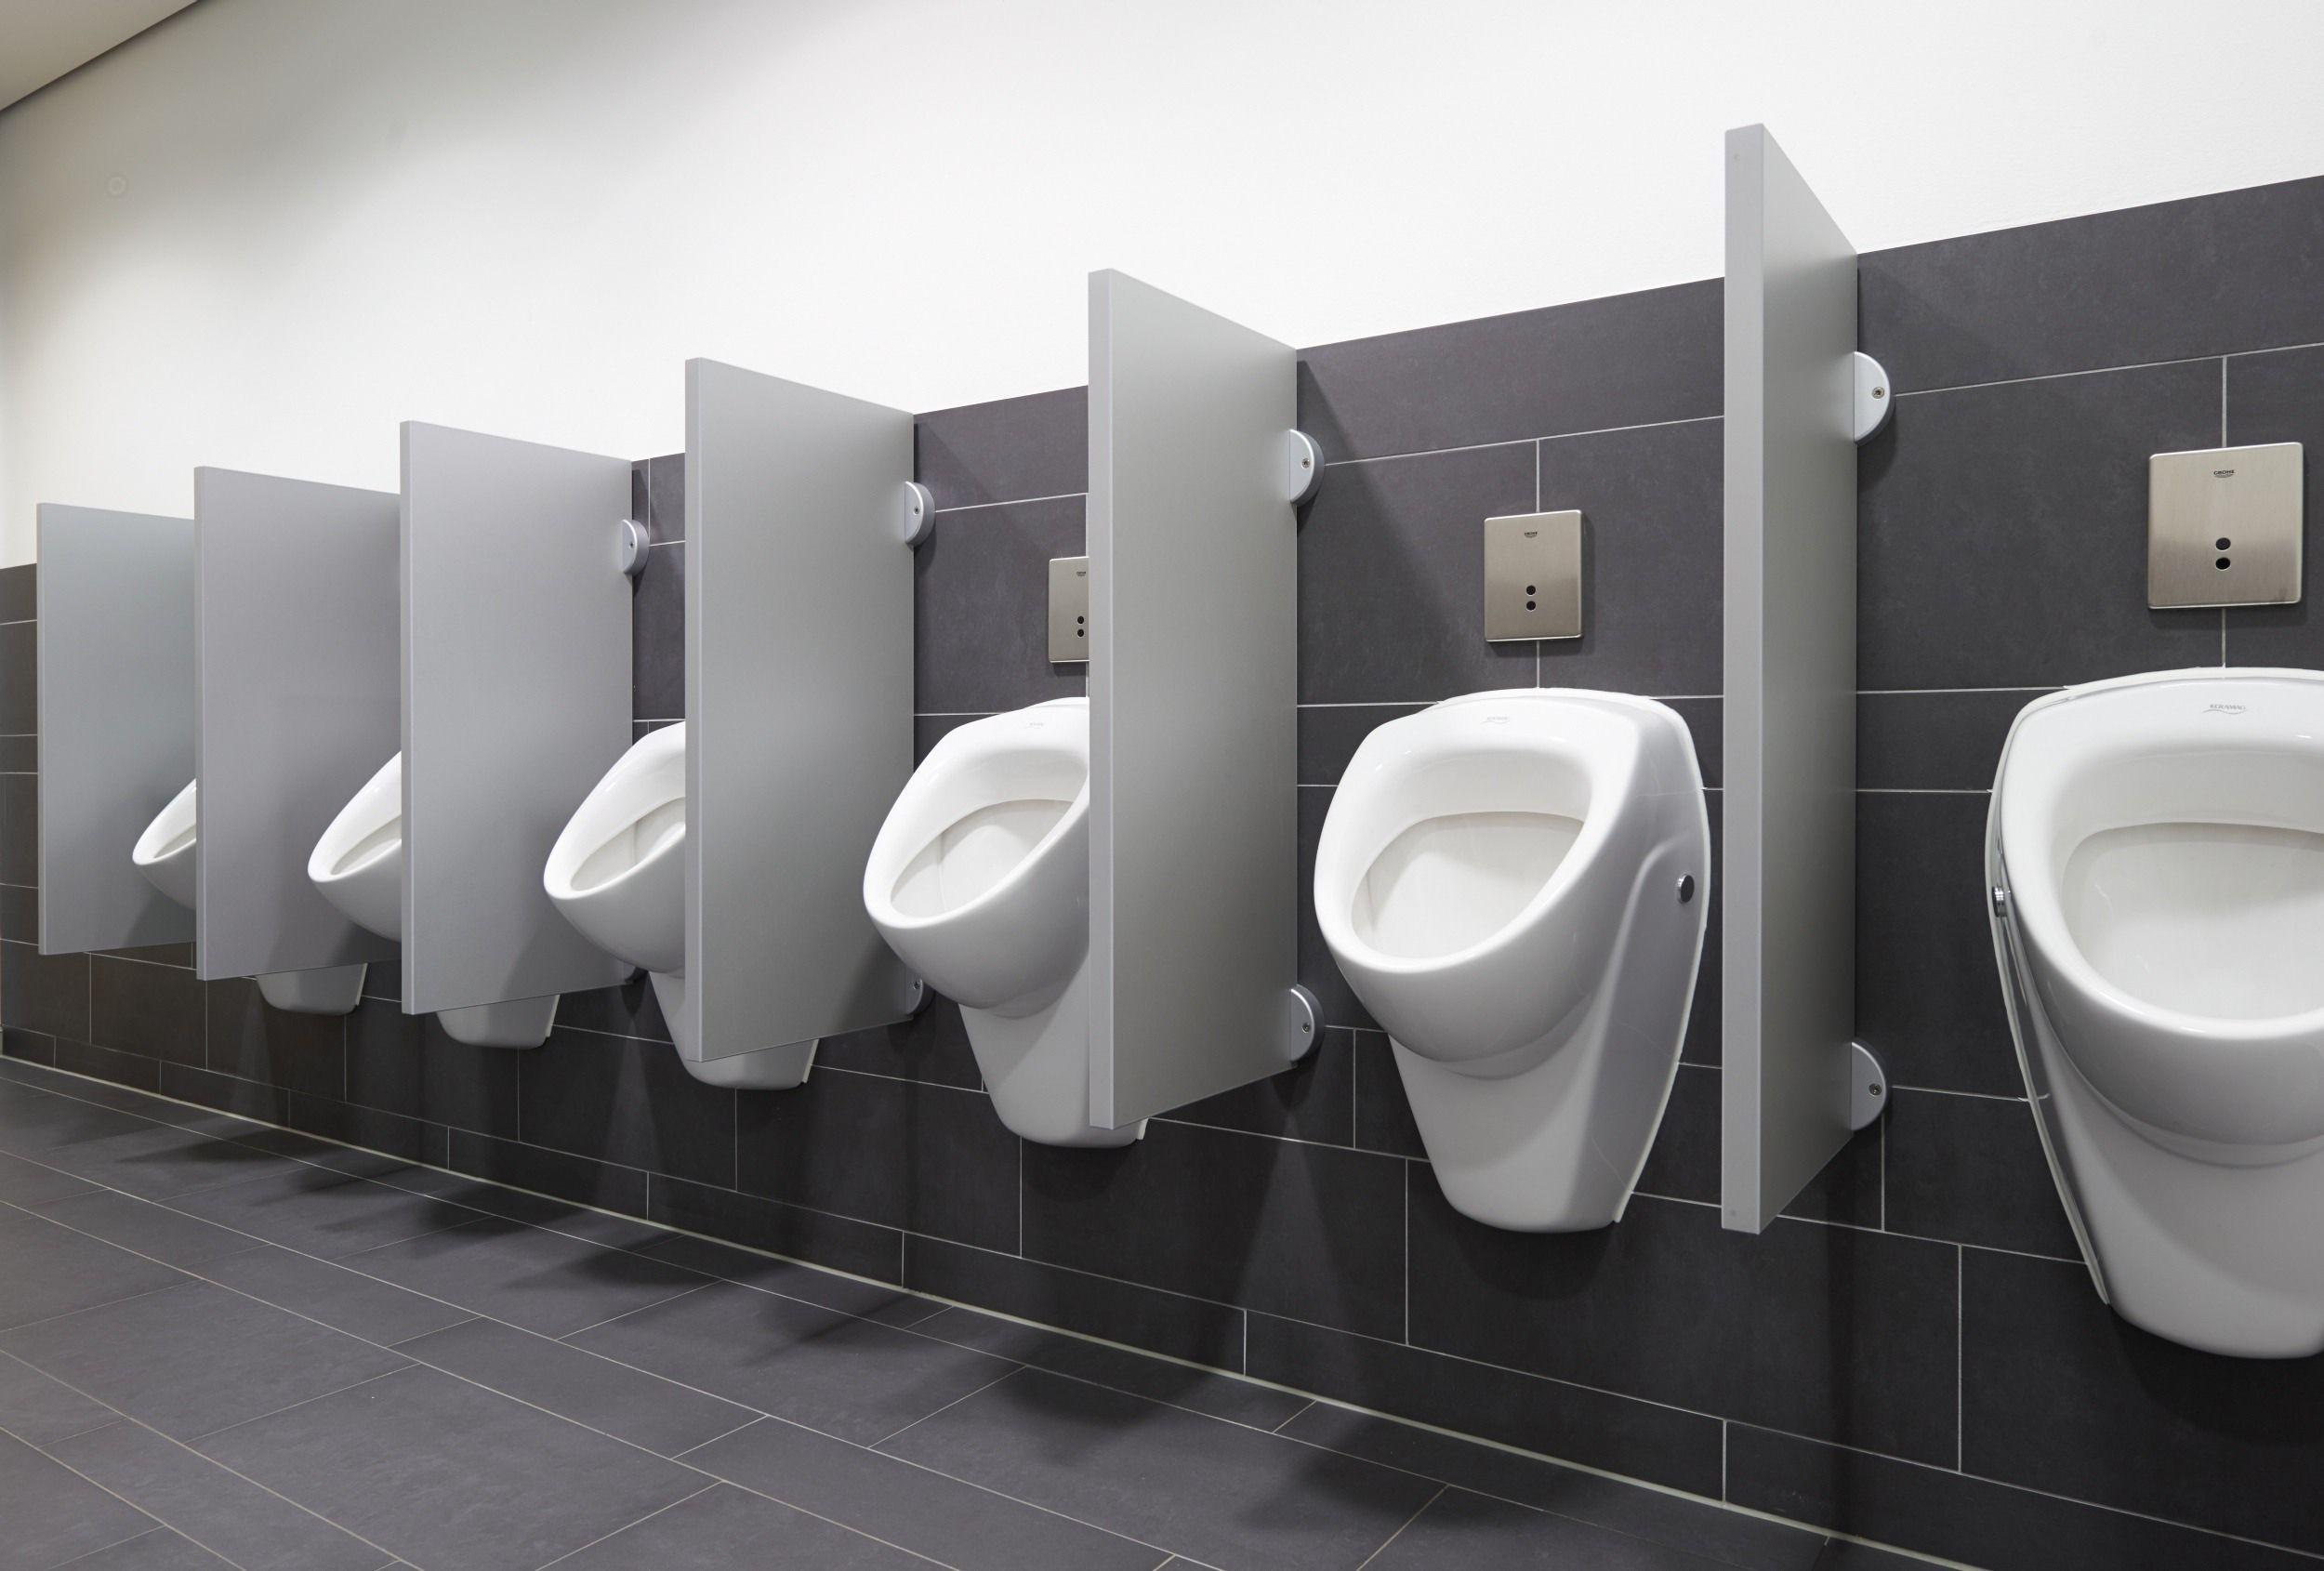 raumhohe wc trennwand svf30 s altus sch fer trennwandsysteme. Black Bedroom Furniture Sets. Home Design Ideas